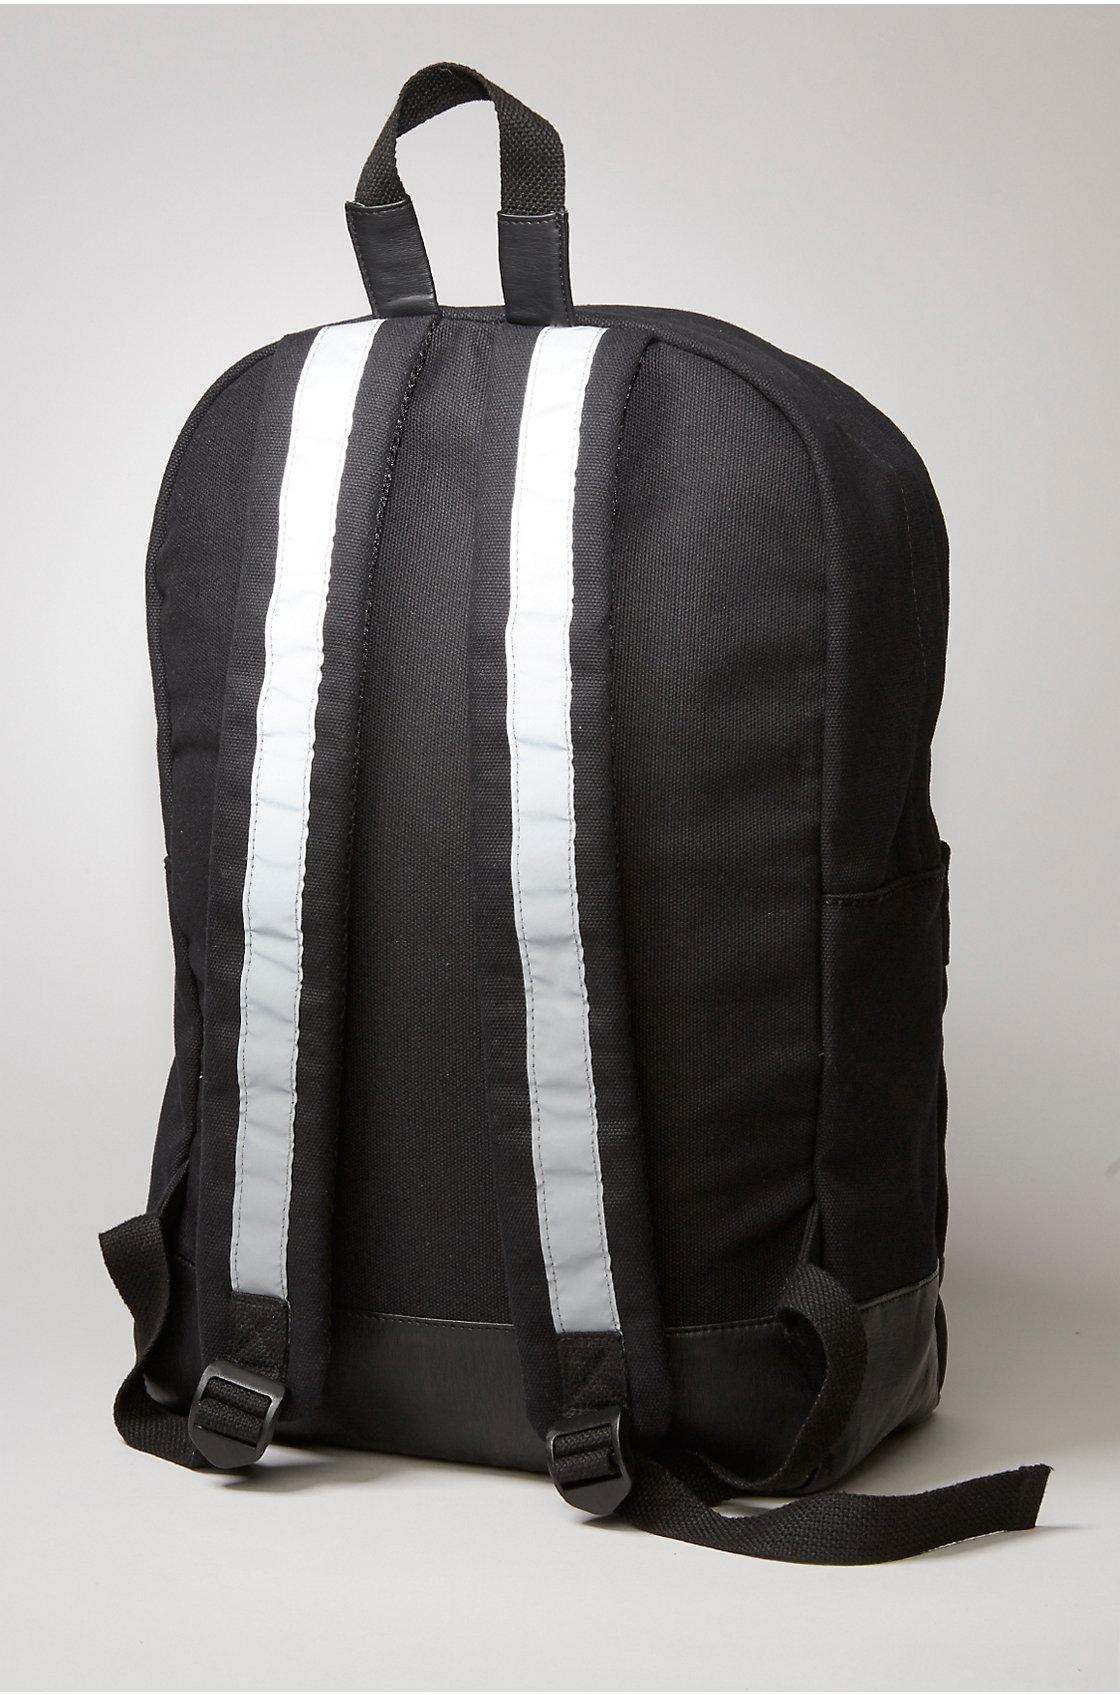 True Religion Reflective Backpack In Black For Men